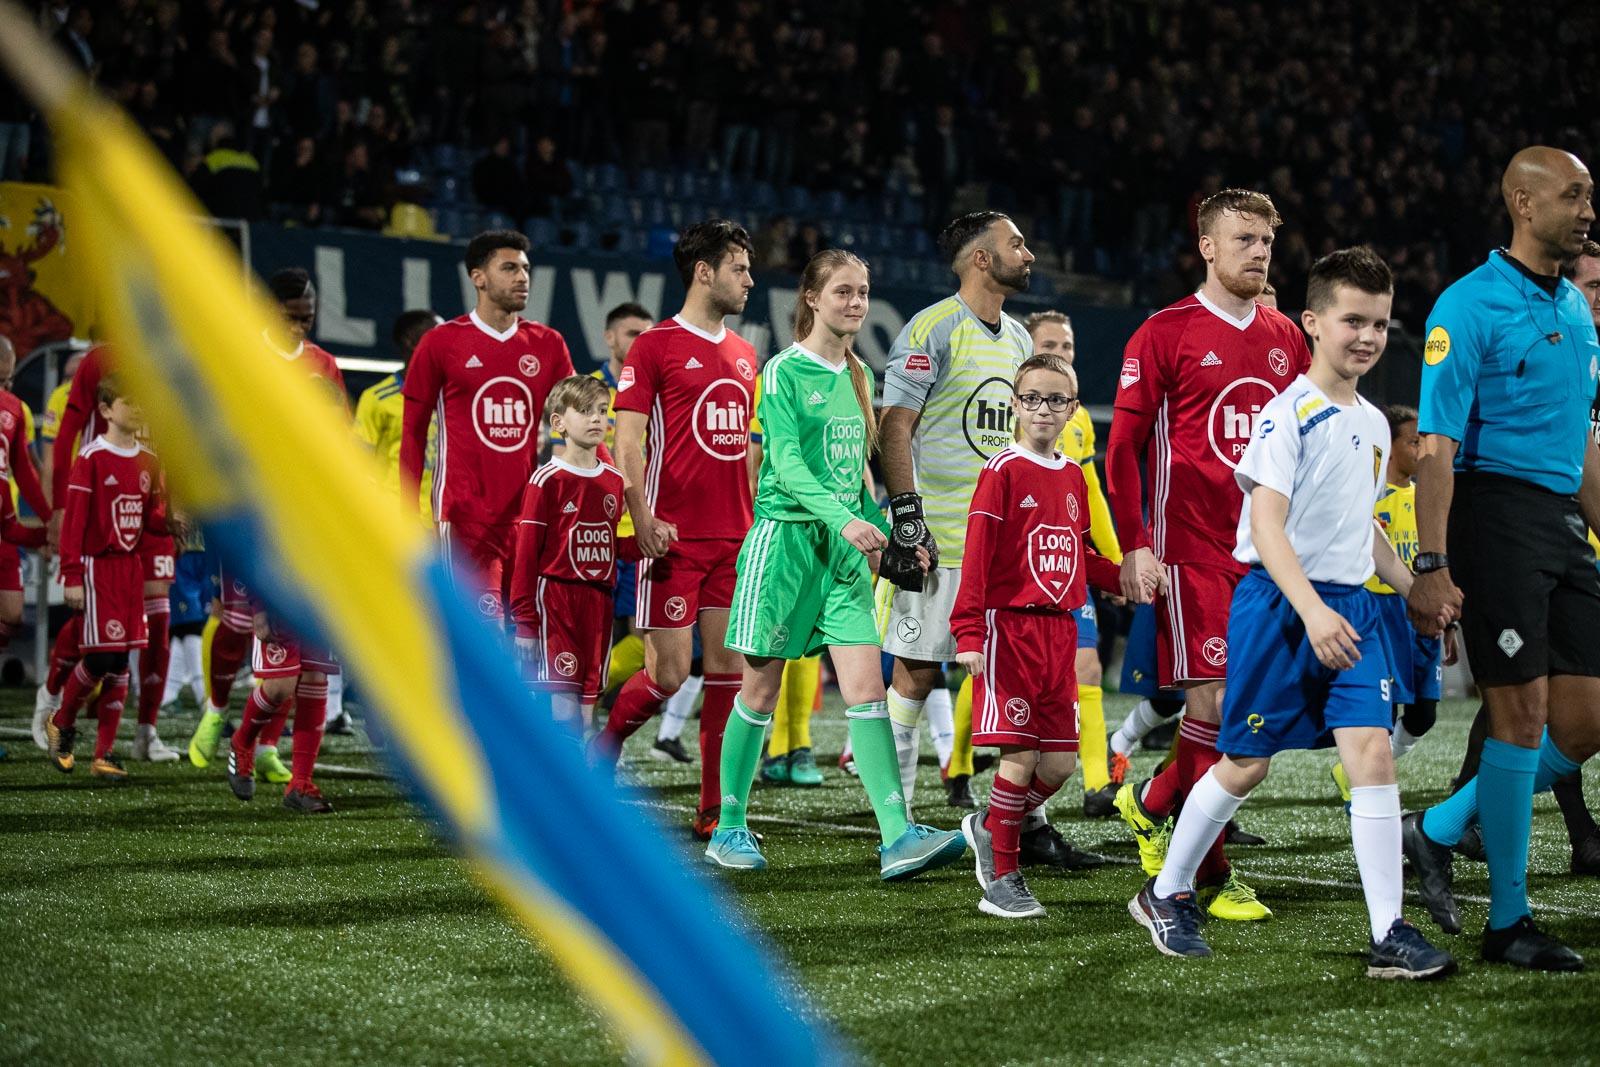 'Eigenwijze' teambuildingsessie in Leeuwarden